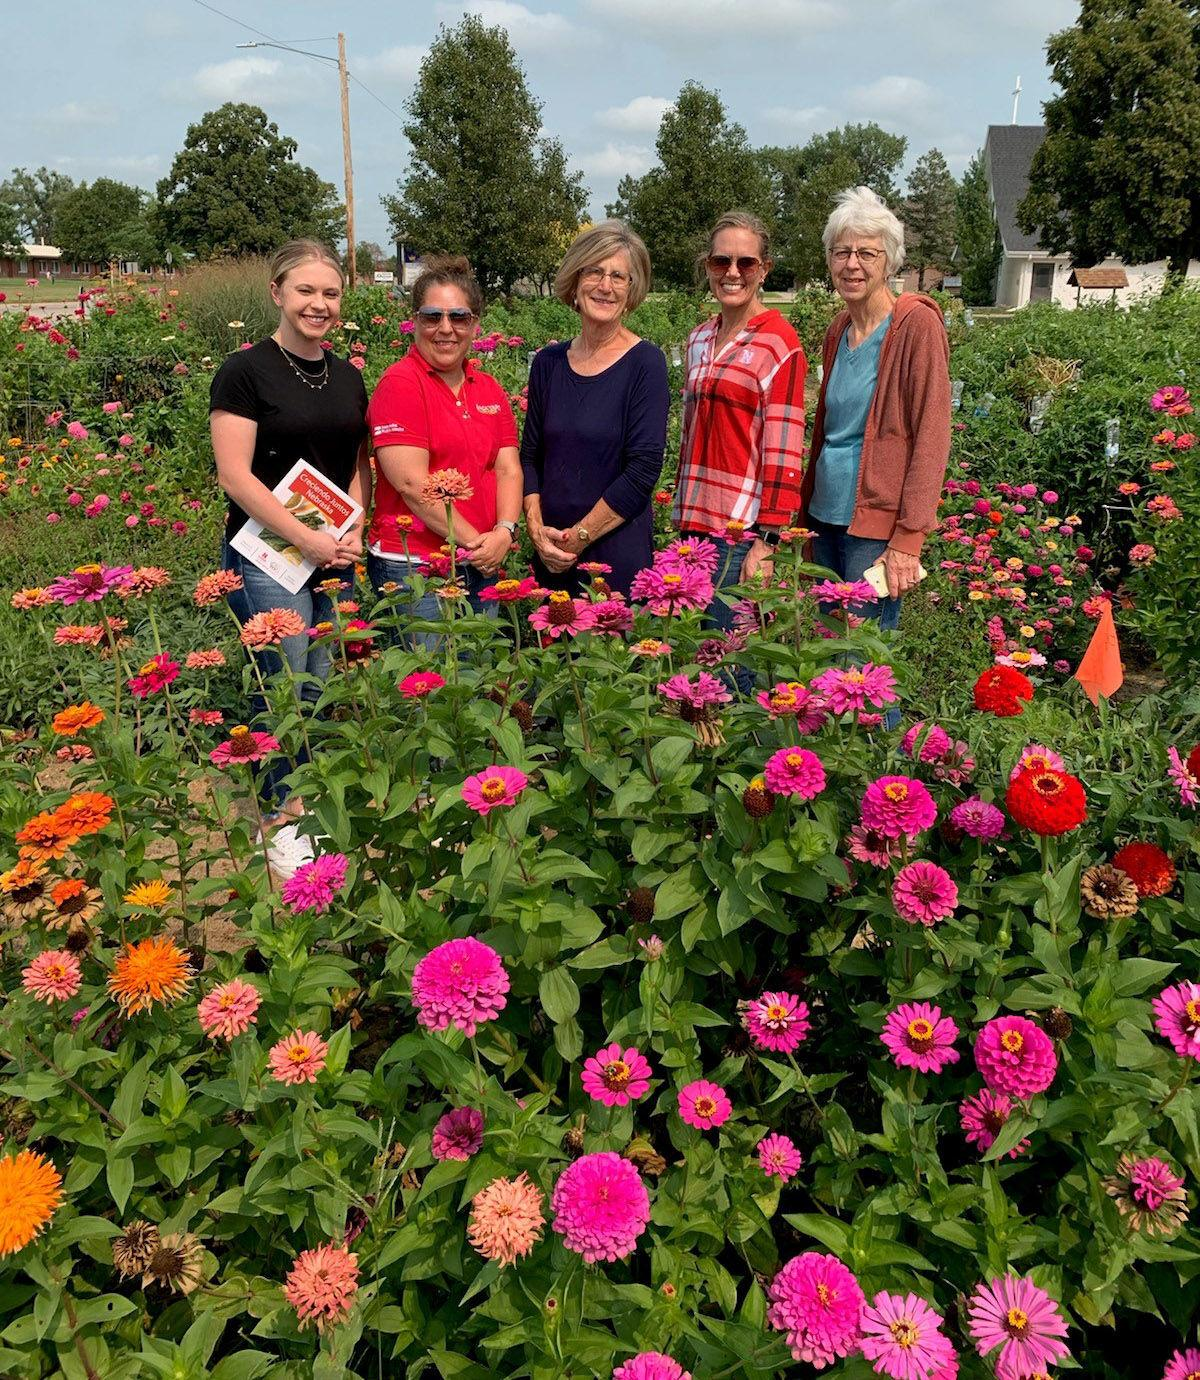 Schuyler Community Garden